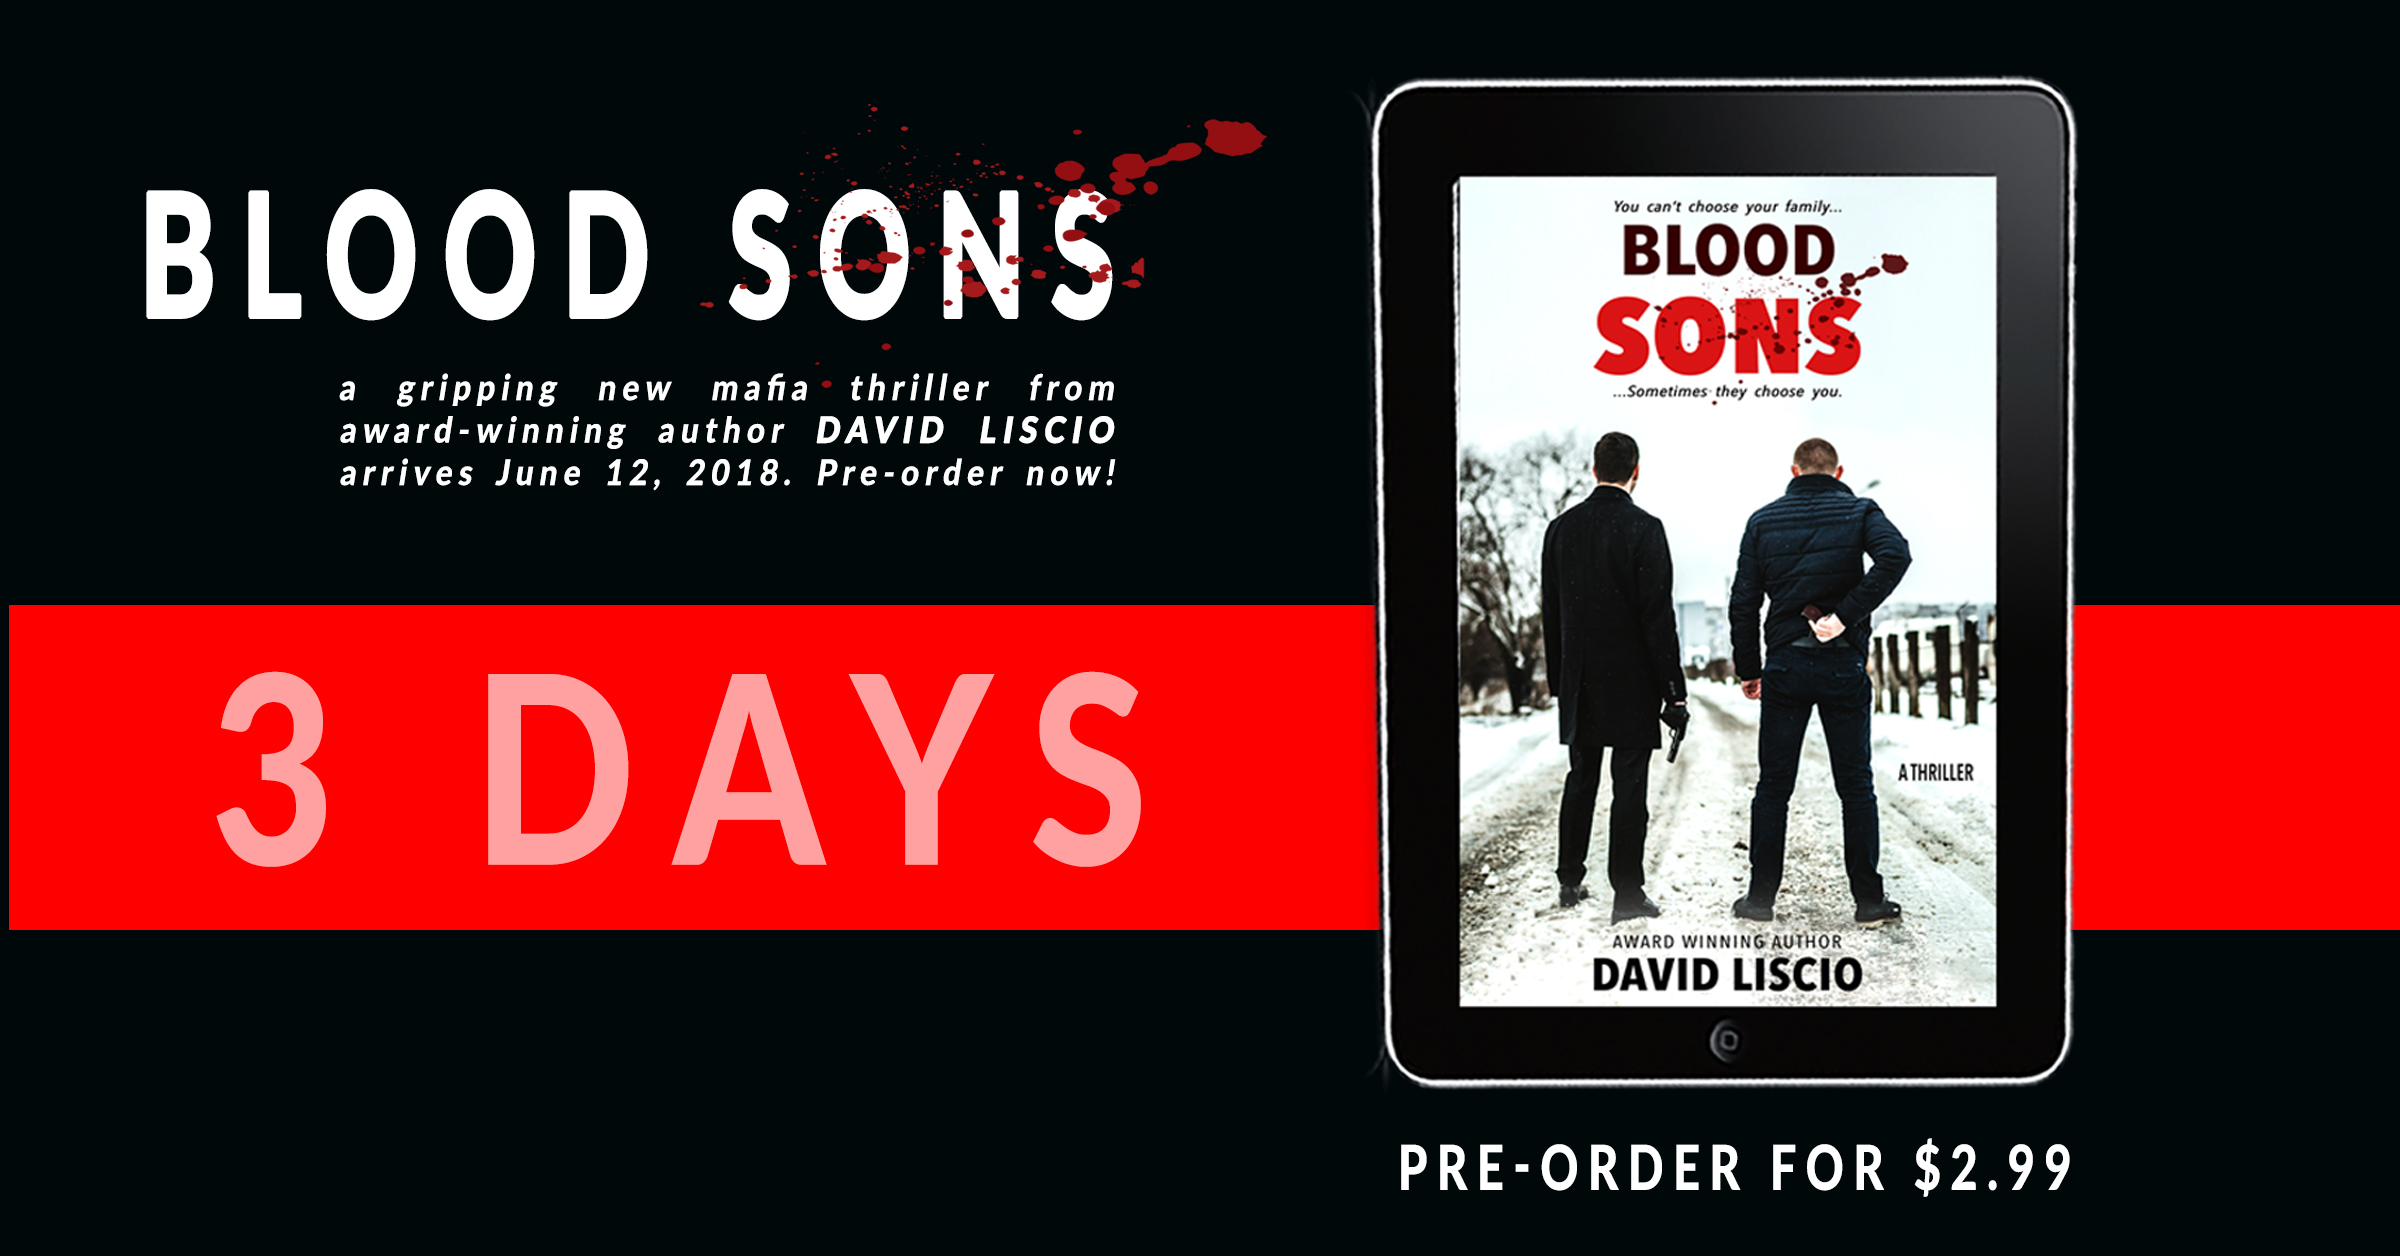 blood sons countdown 3 days.jpg